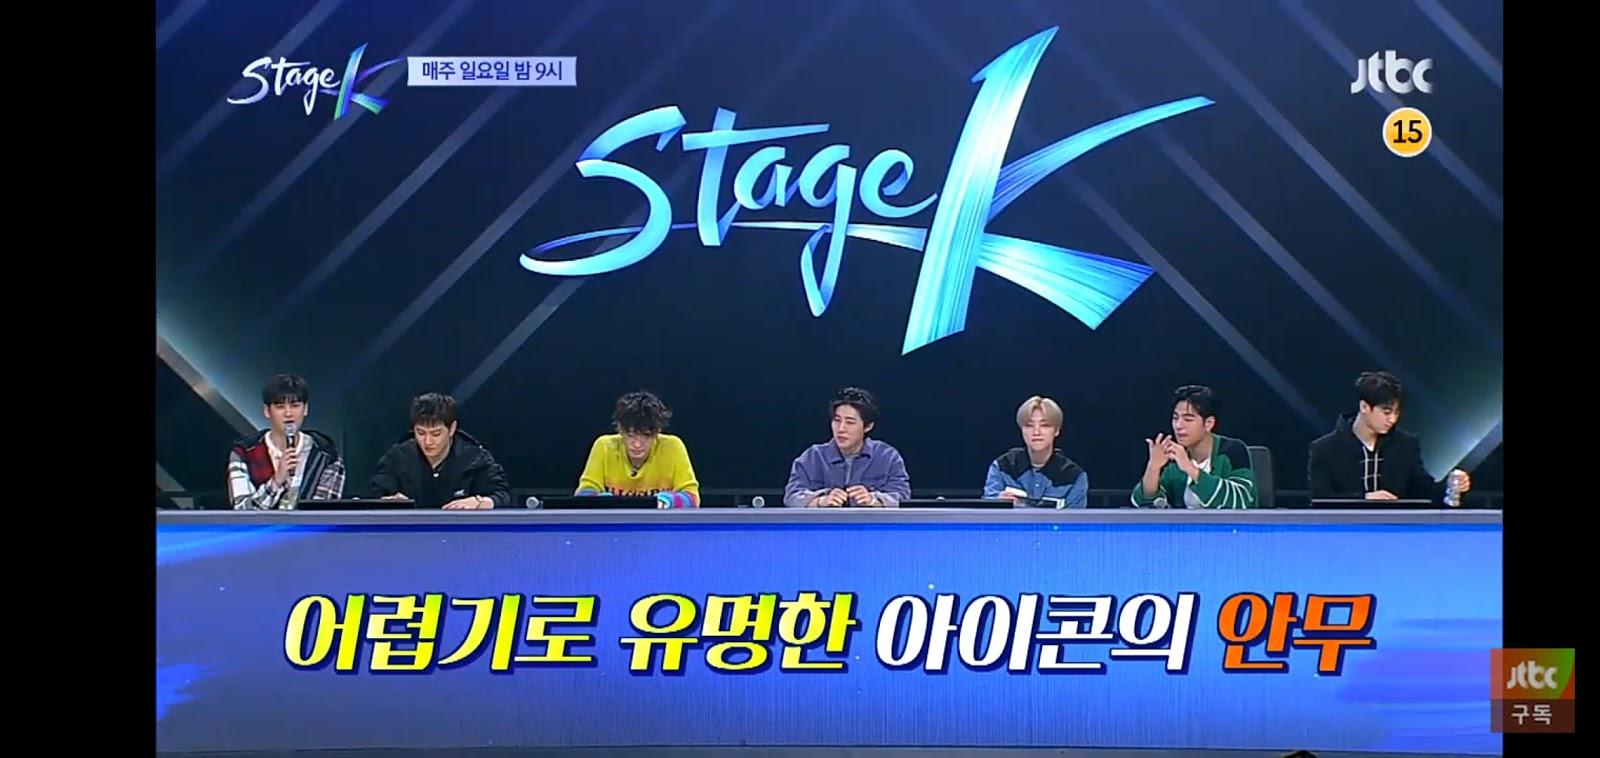 iKON on JTBC Stage-K Preview - iKON Updates